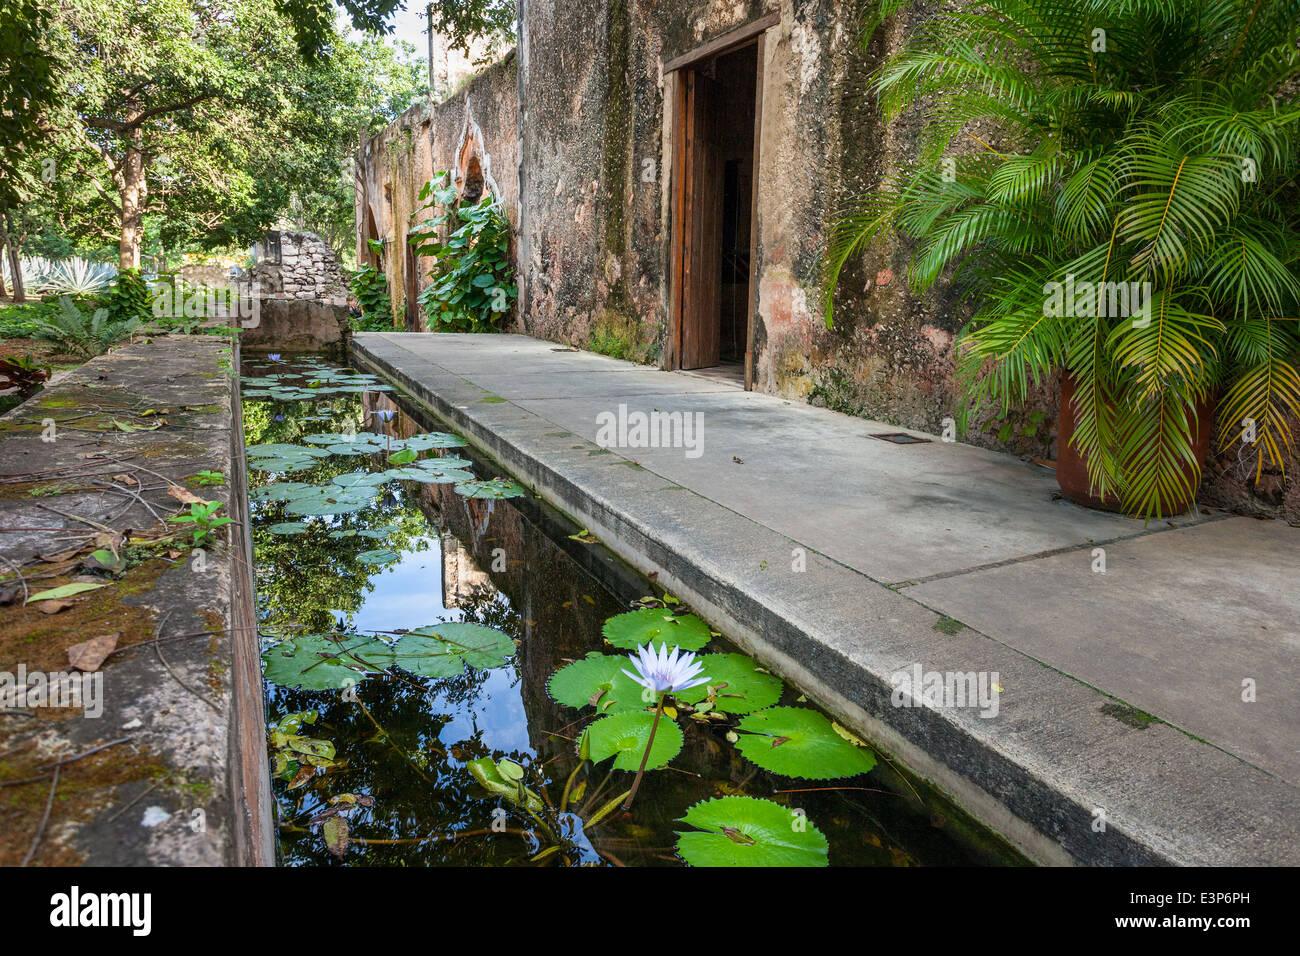 Water lilies on a pond at San Pedro Ochil hacienda in Yucatan, Mexico. - Stock Image